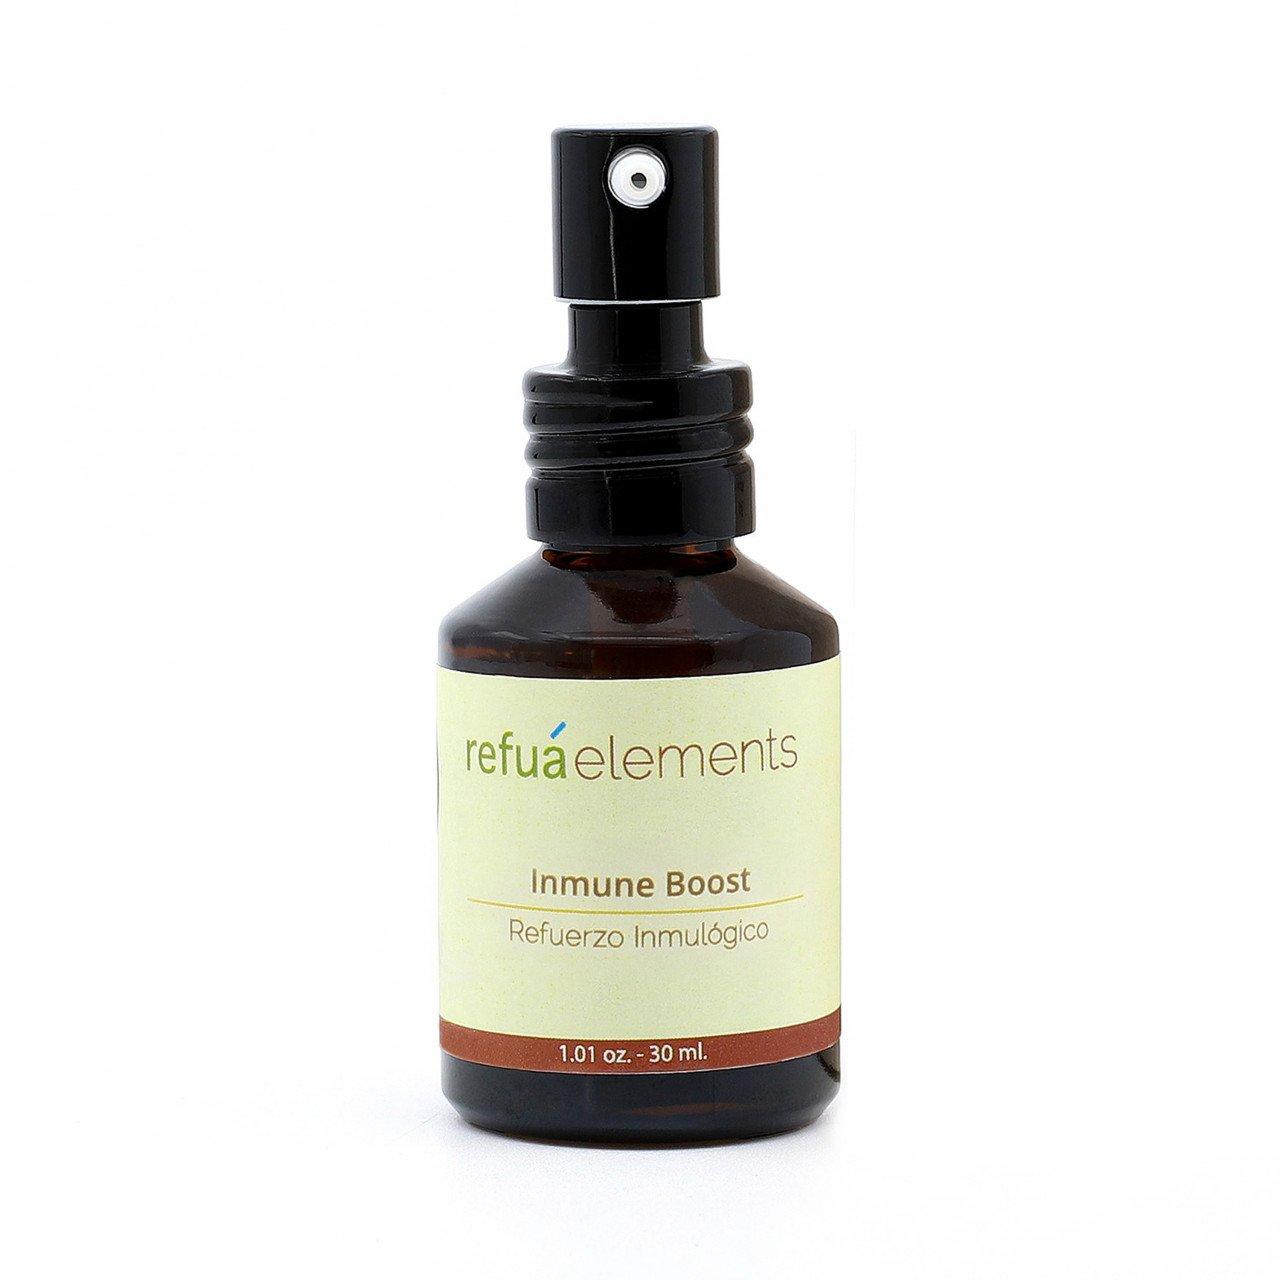 Inmune Boost Mezcla De Aceites Esenciales Aromaterapia&w=900&h=900&fit=crop